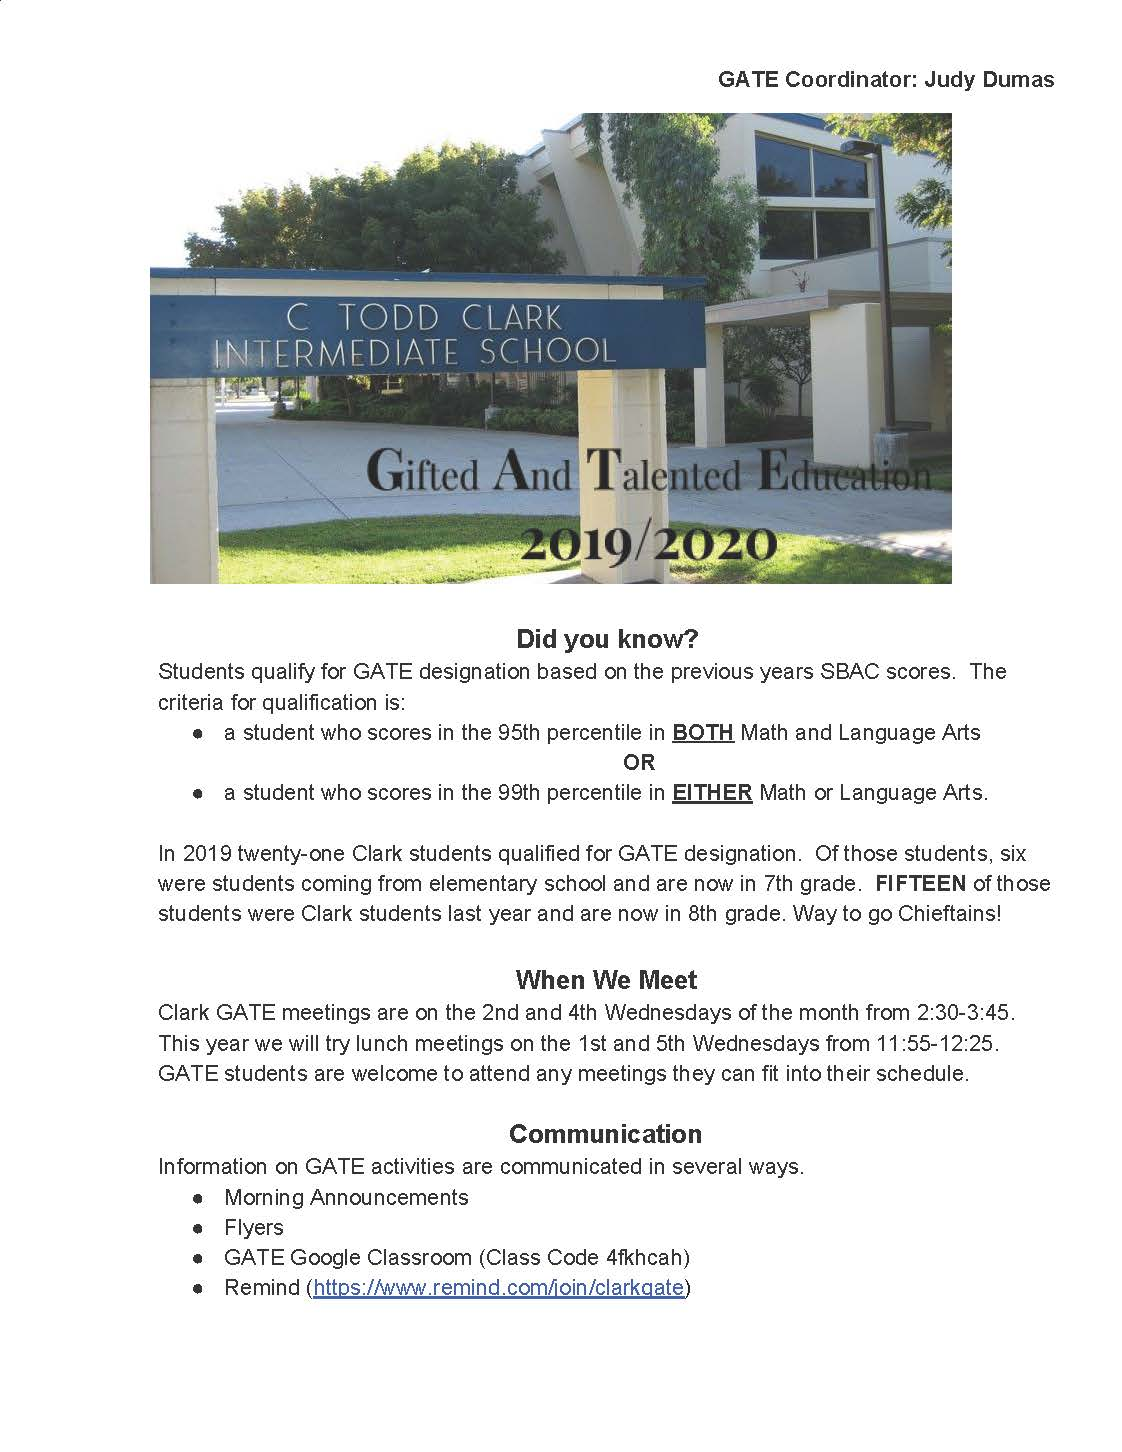 Gate Information Flyer